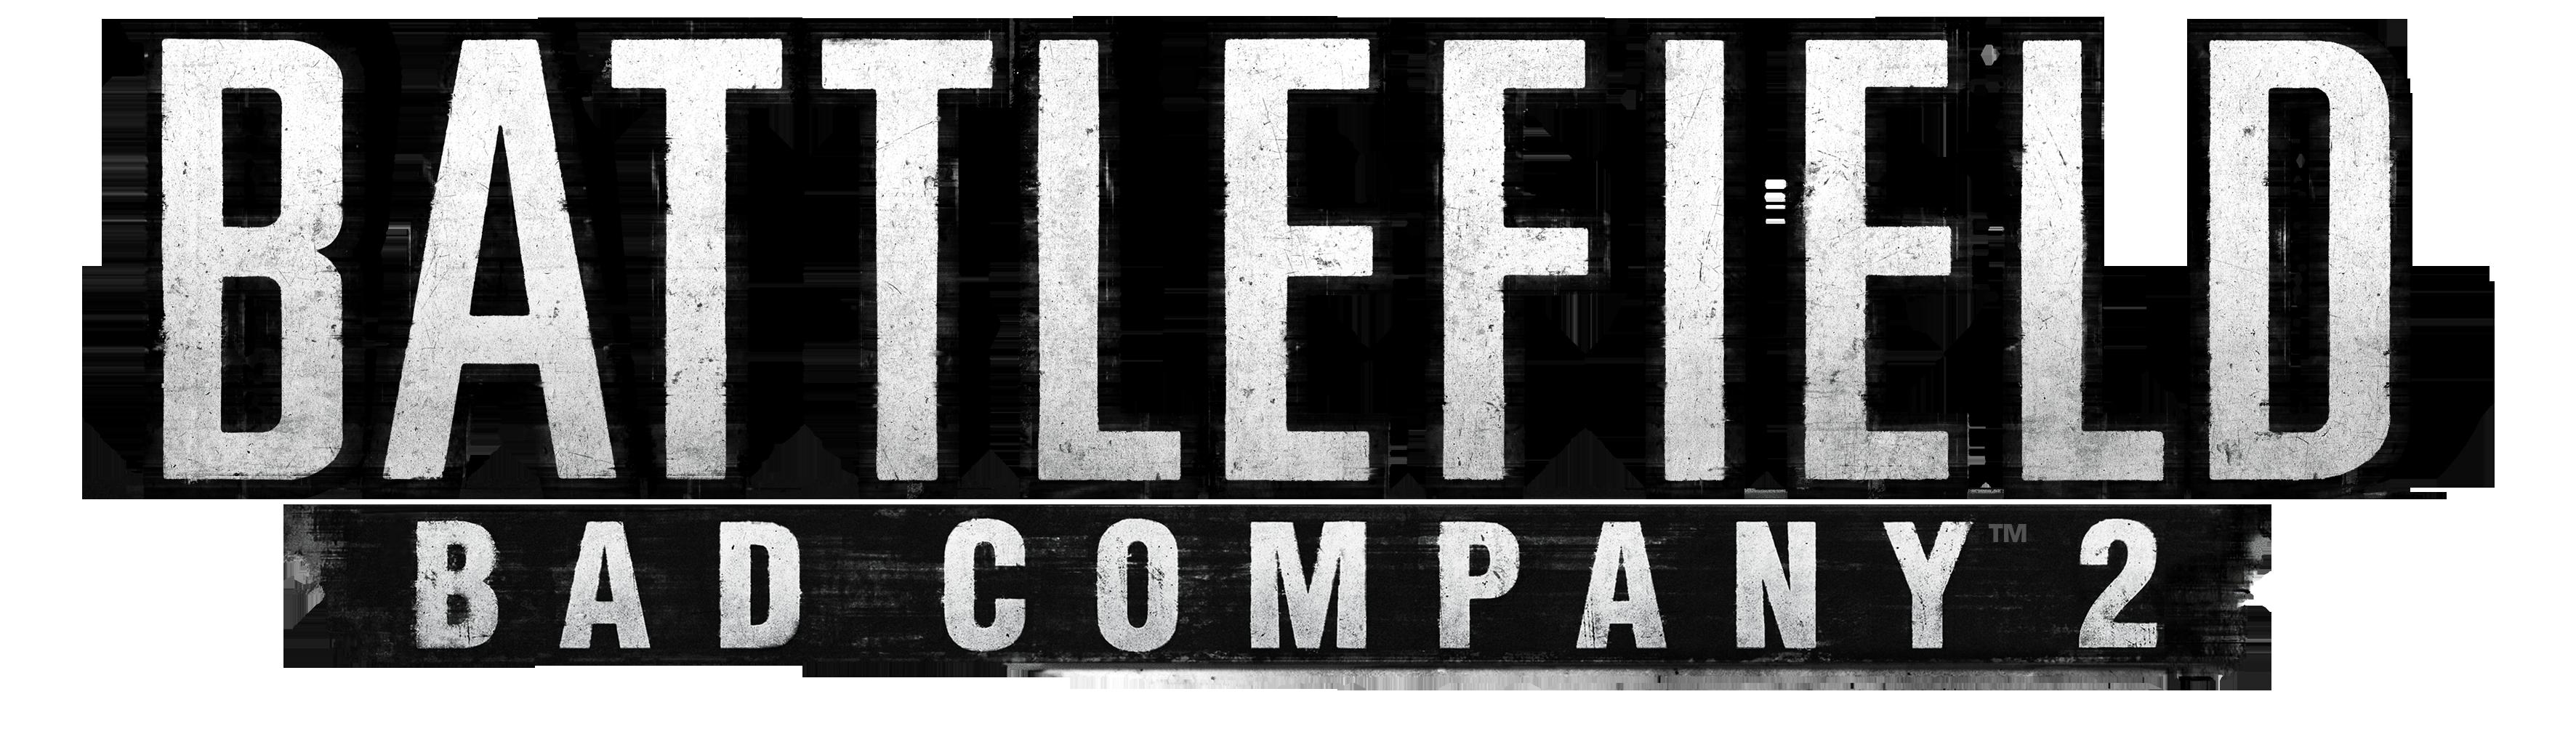 battlefield 2 клиента версию: